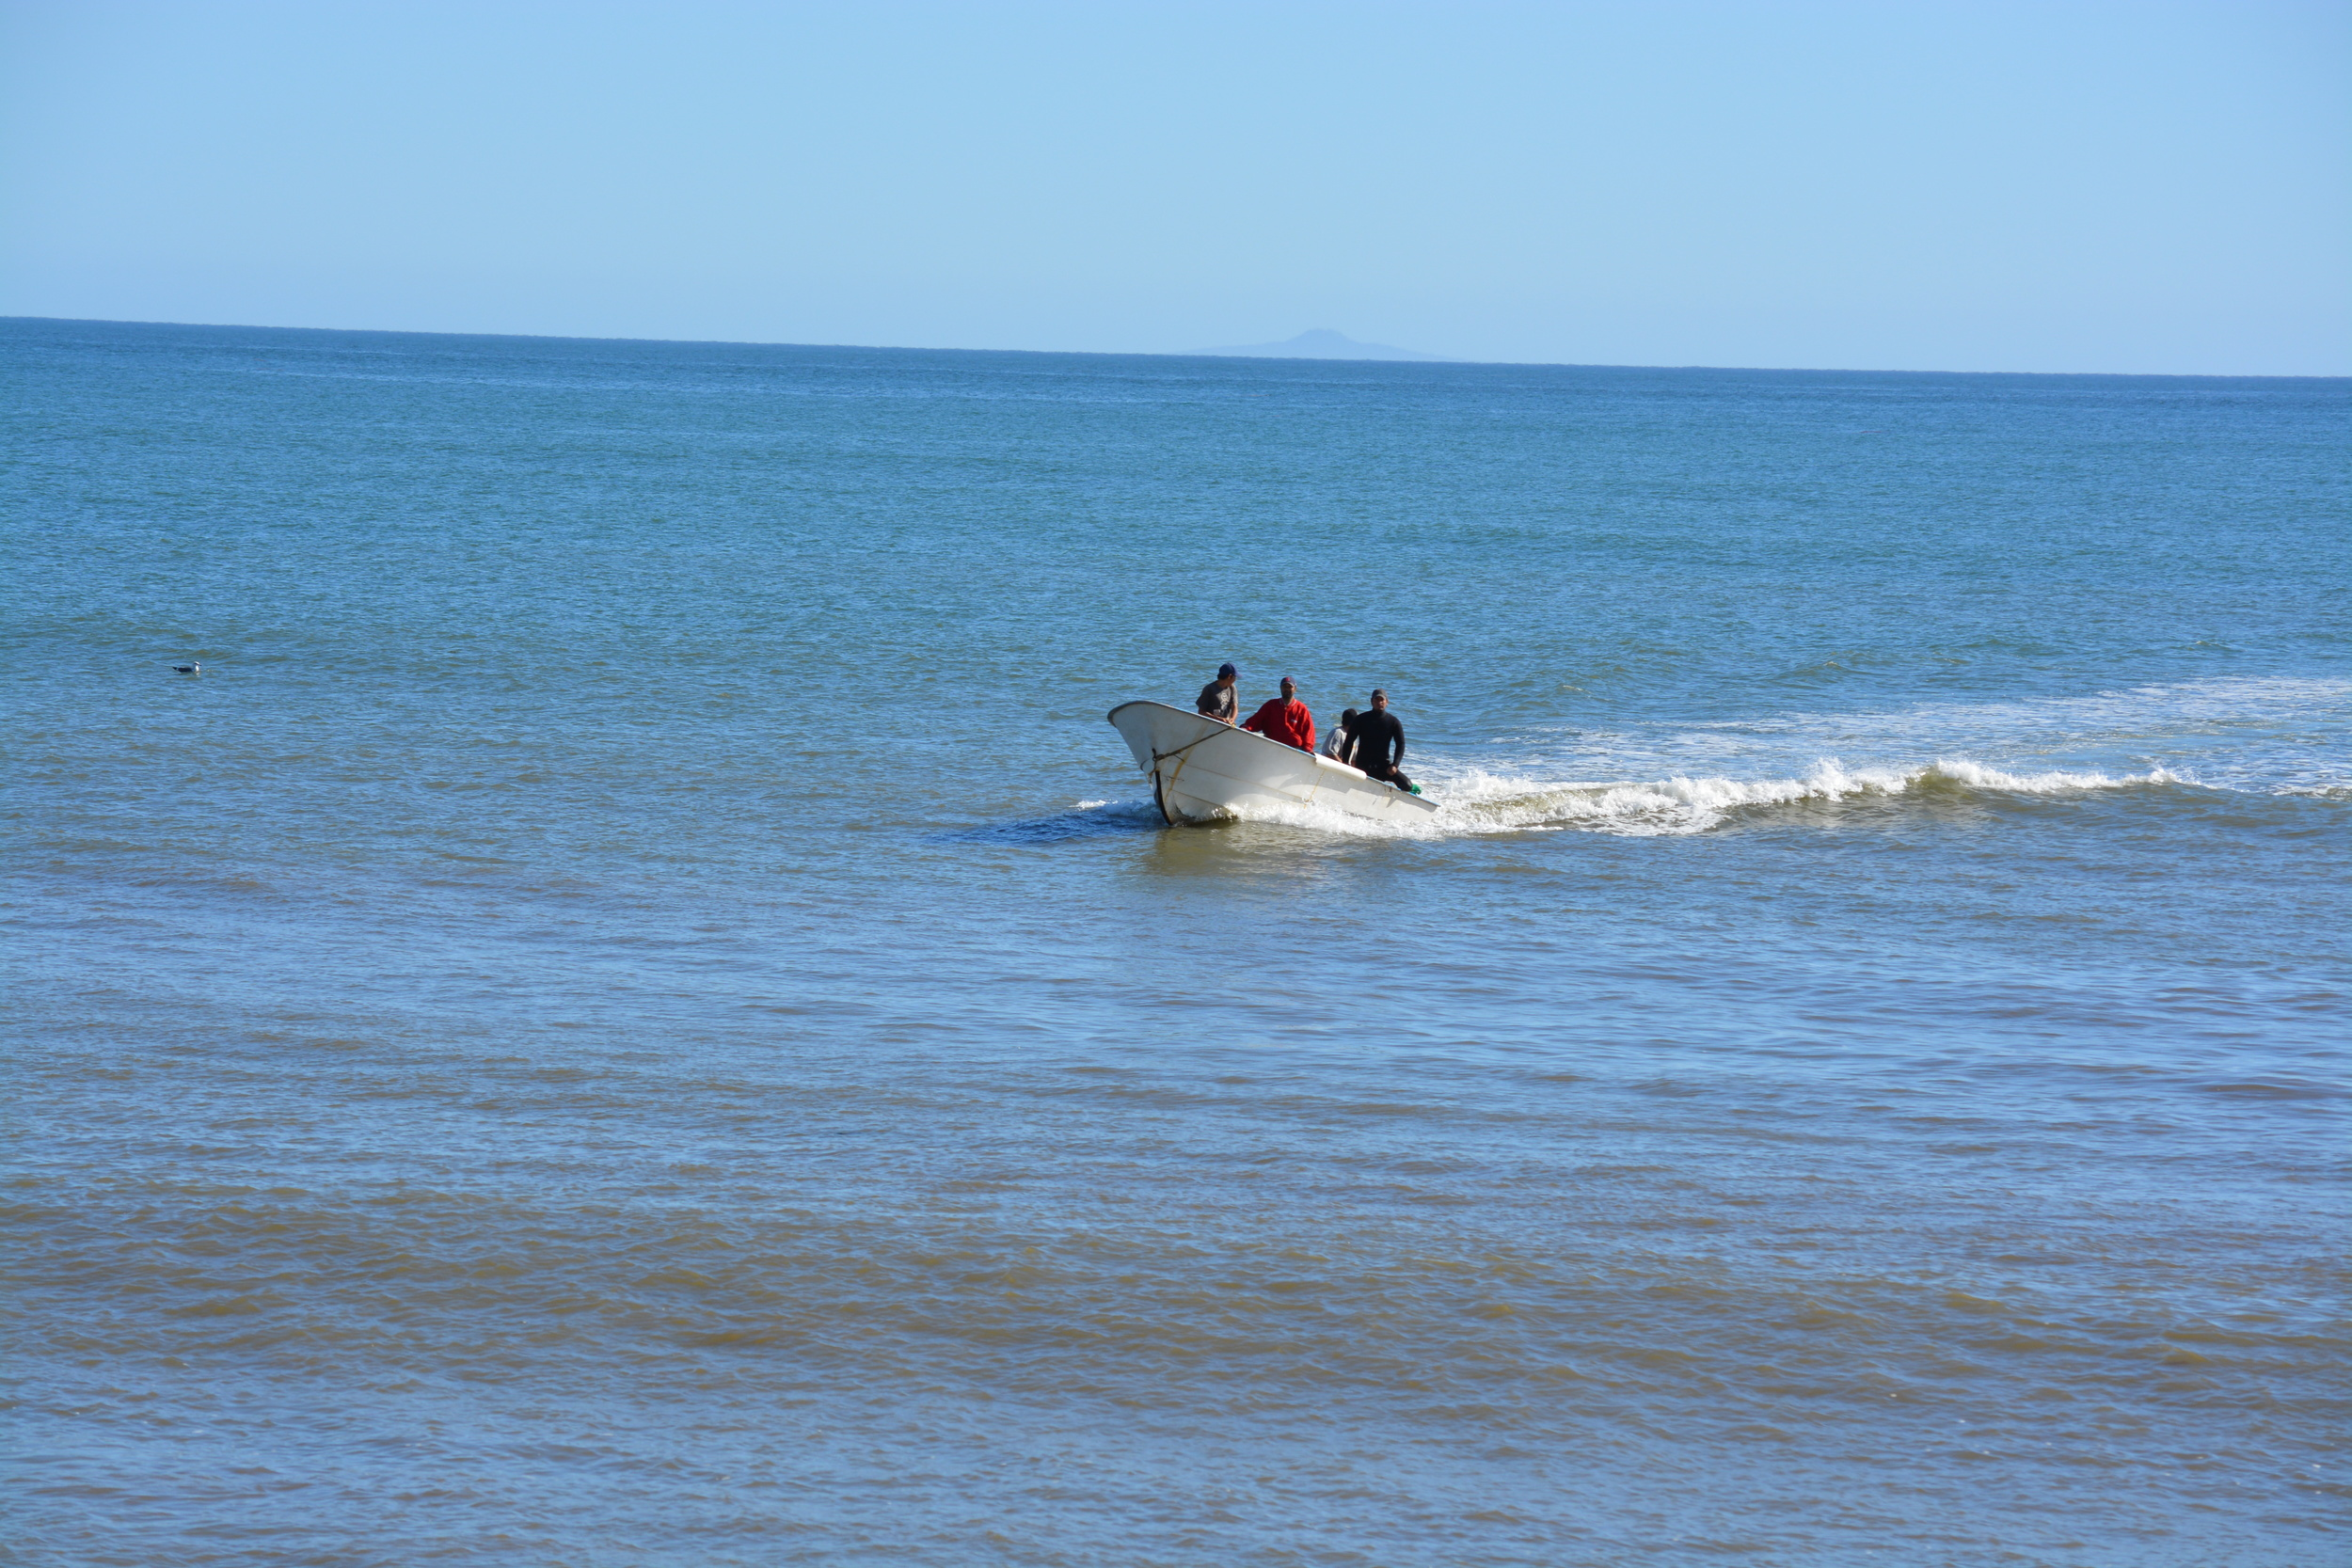 Baja California 10-5-13 Shipwrecks Surfing Adventure Ocean Experience Surf School San Diego (74).JPG